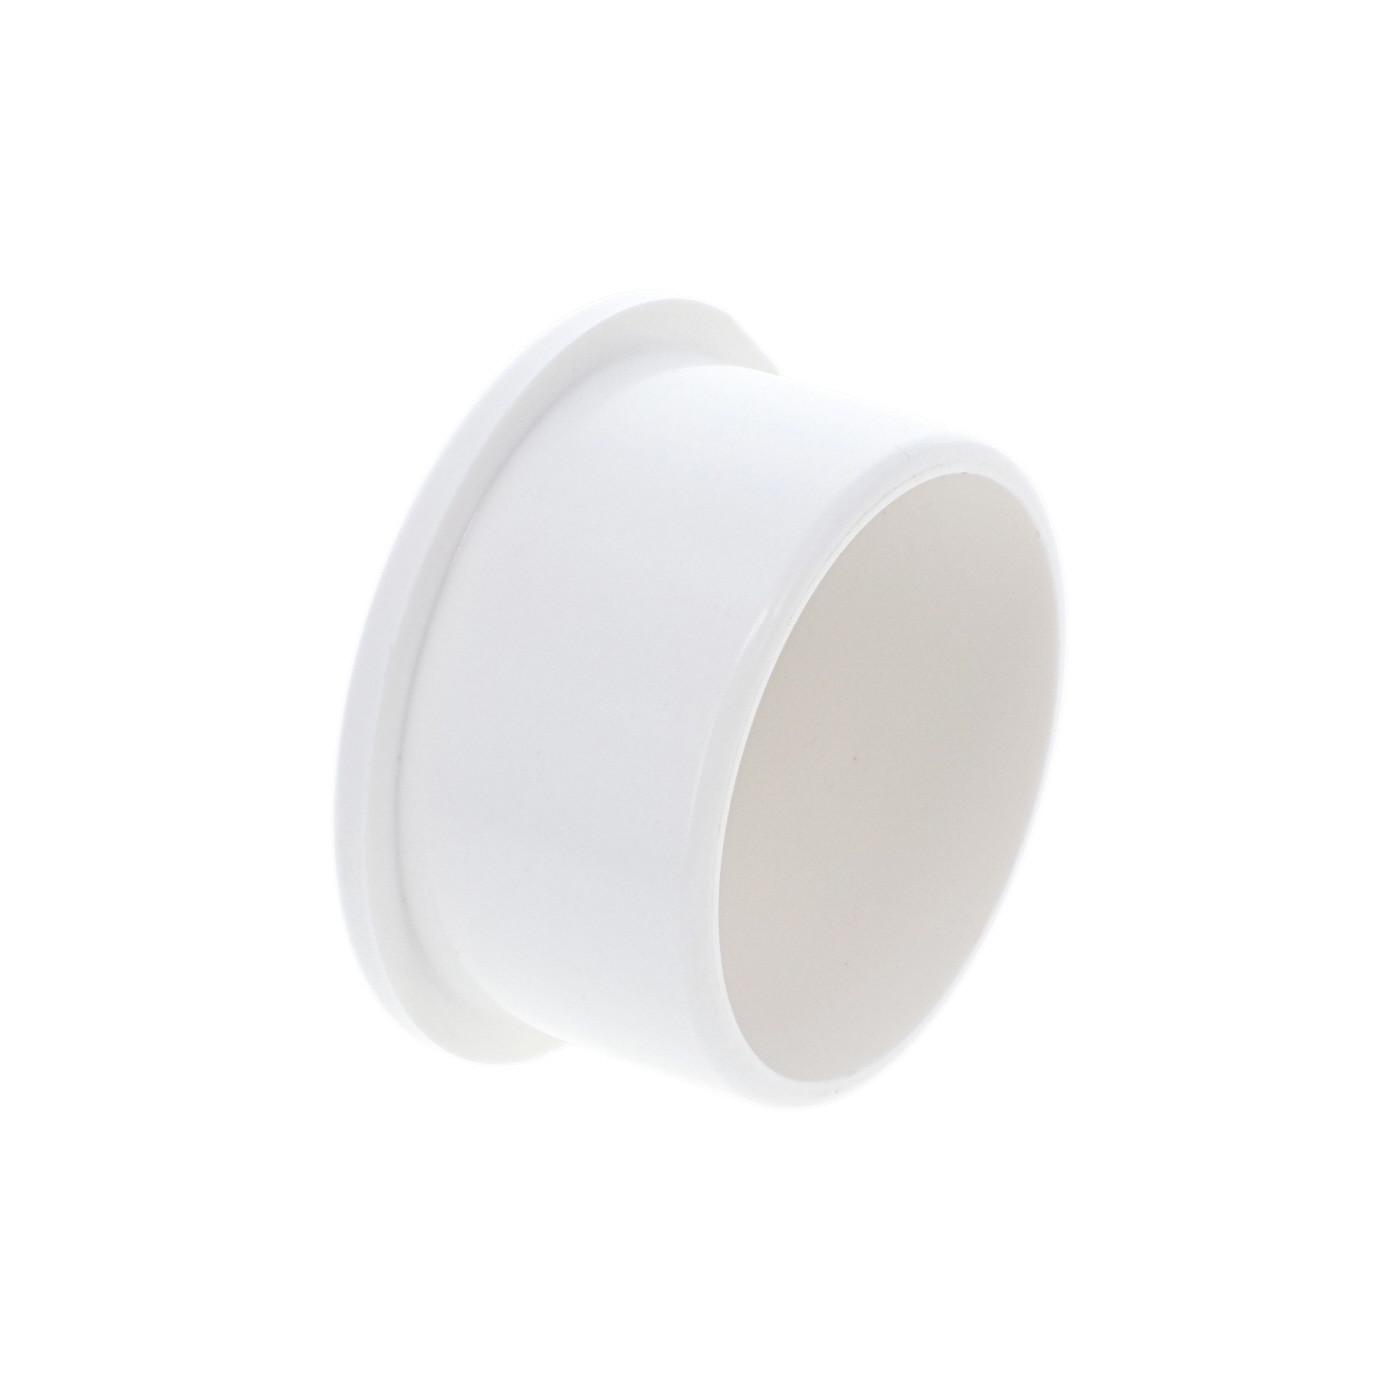 "1.5"" M Pipe / Manifold Cap"